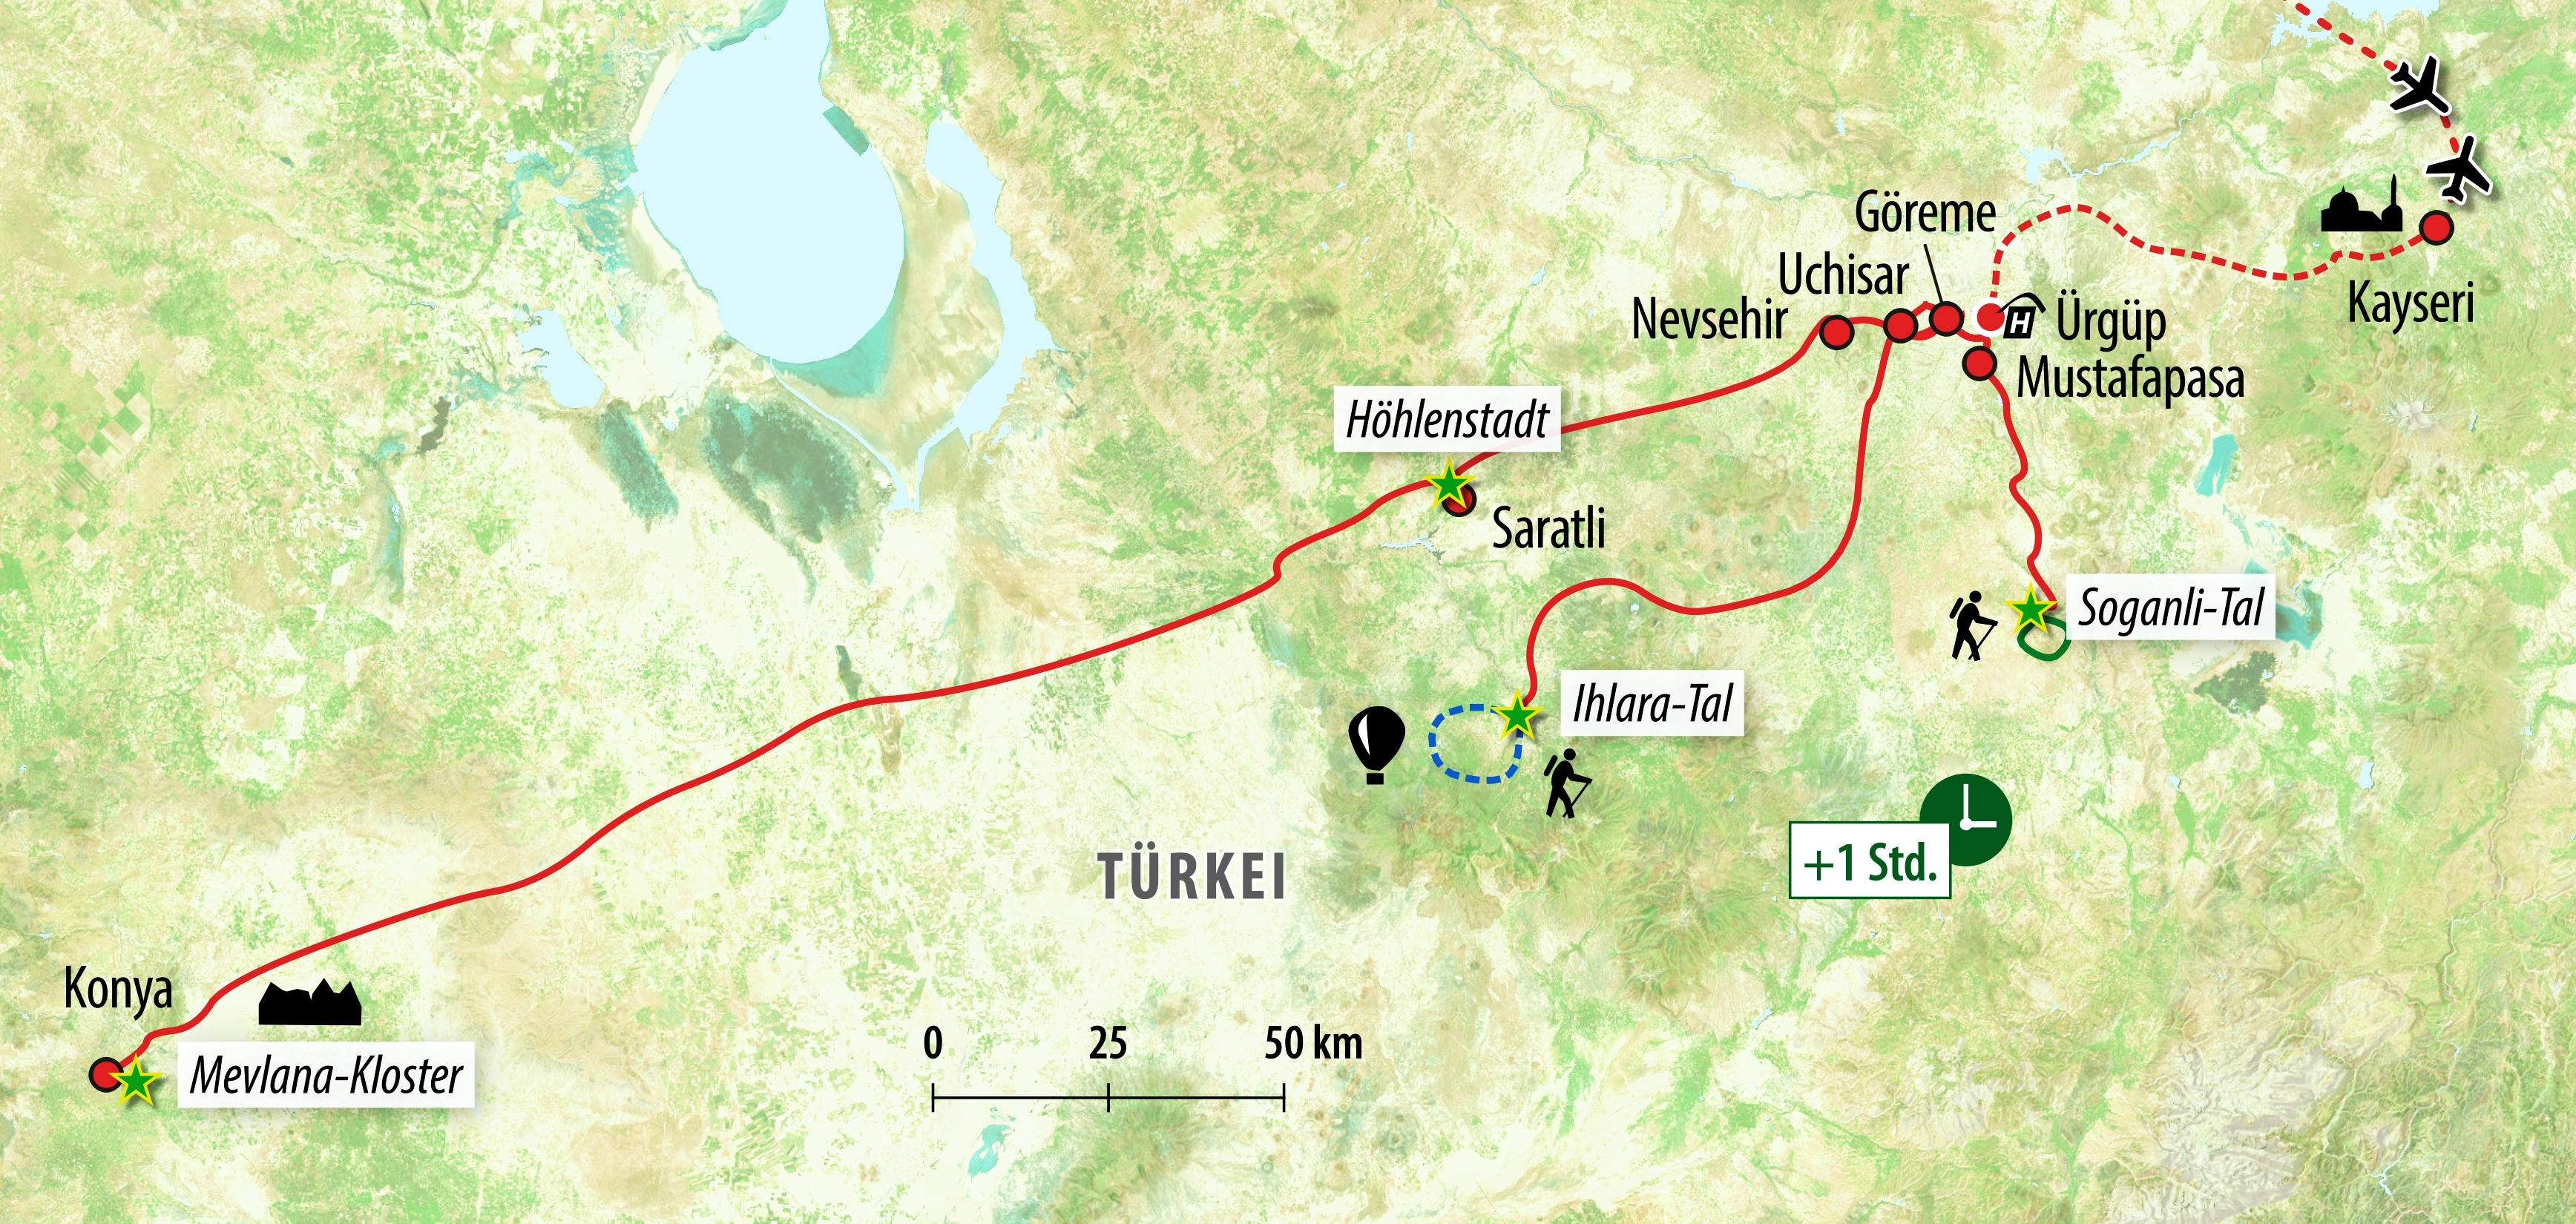 Karte Türkei Kappadokien.Wanderreise Türkei Kappadokien